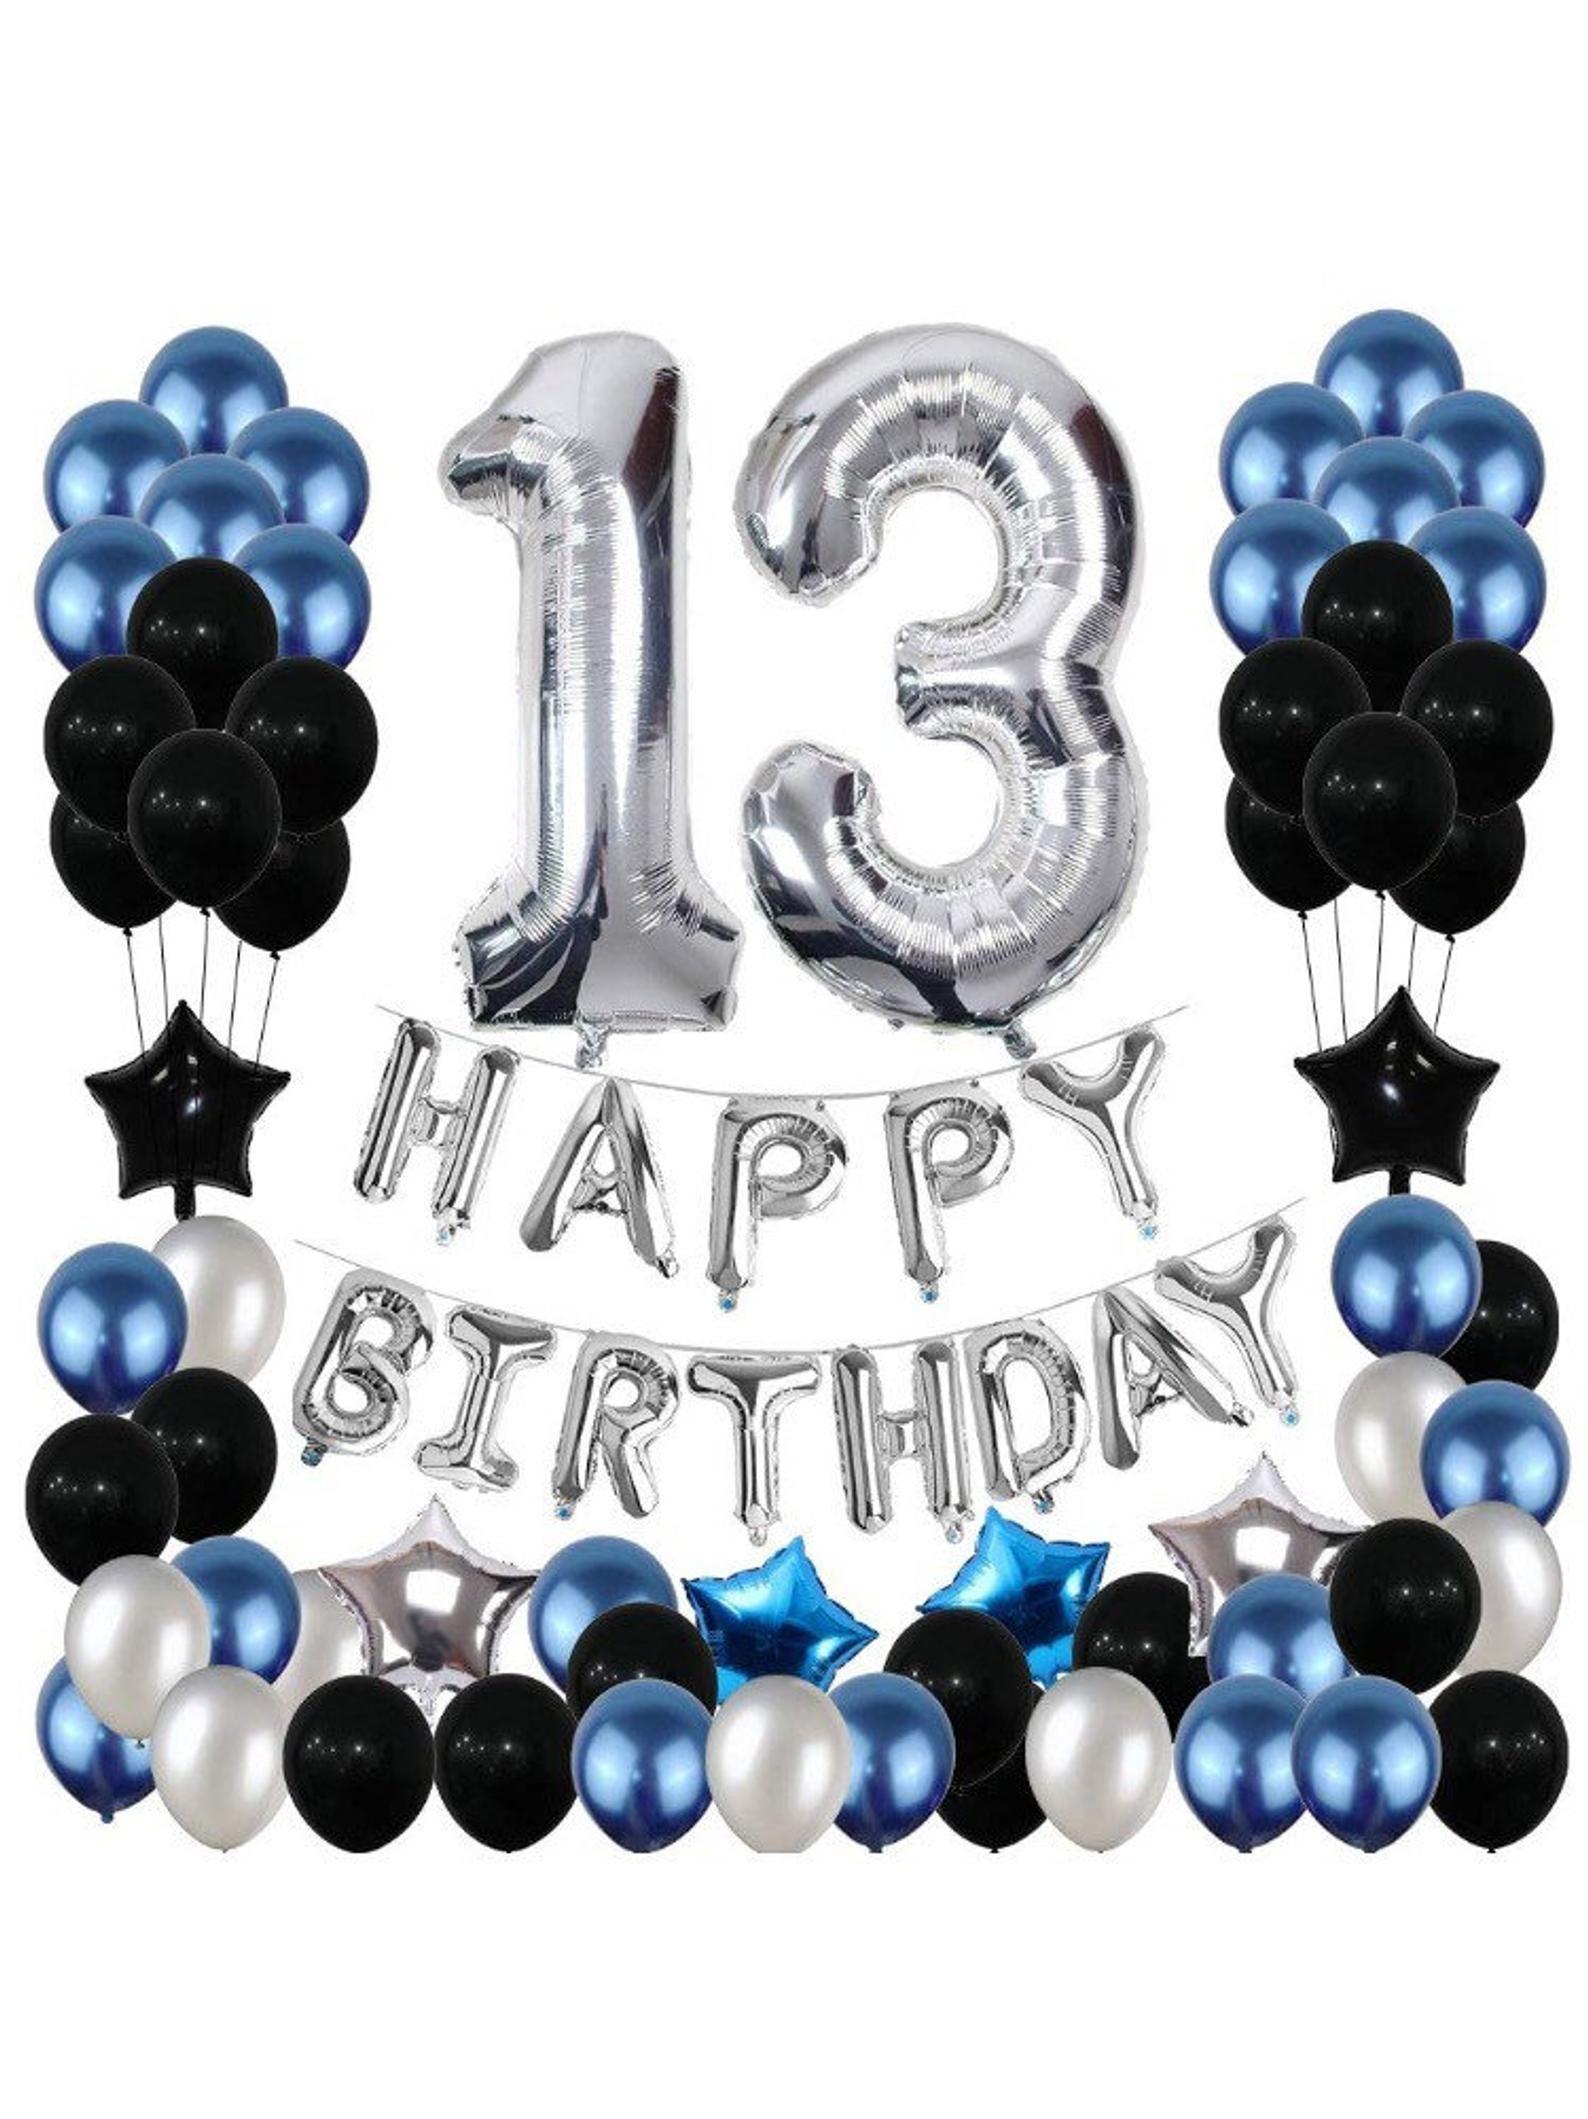 13th Birthday Decorations 13 Birthday Party Decoration Etsy In 2021 21st Birthday Decorations 21 Birthday Party Decorations Blue Party Decorations